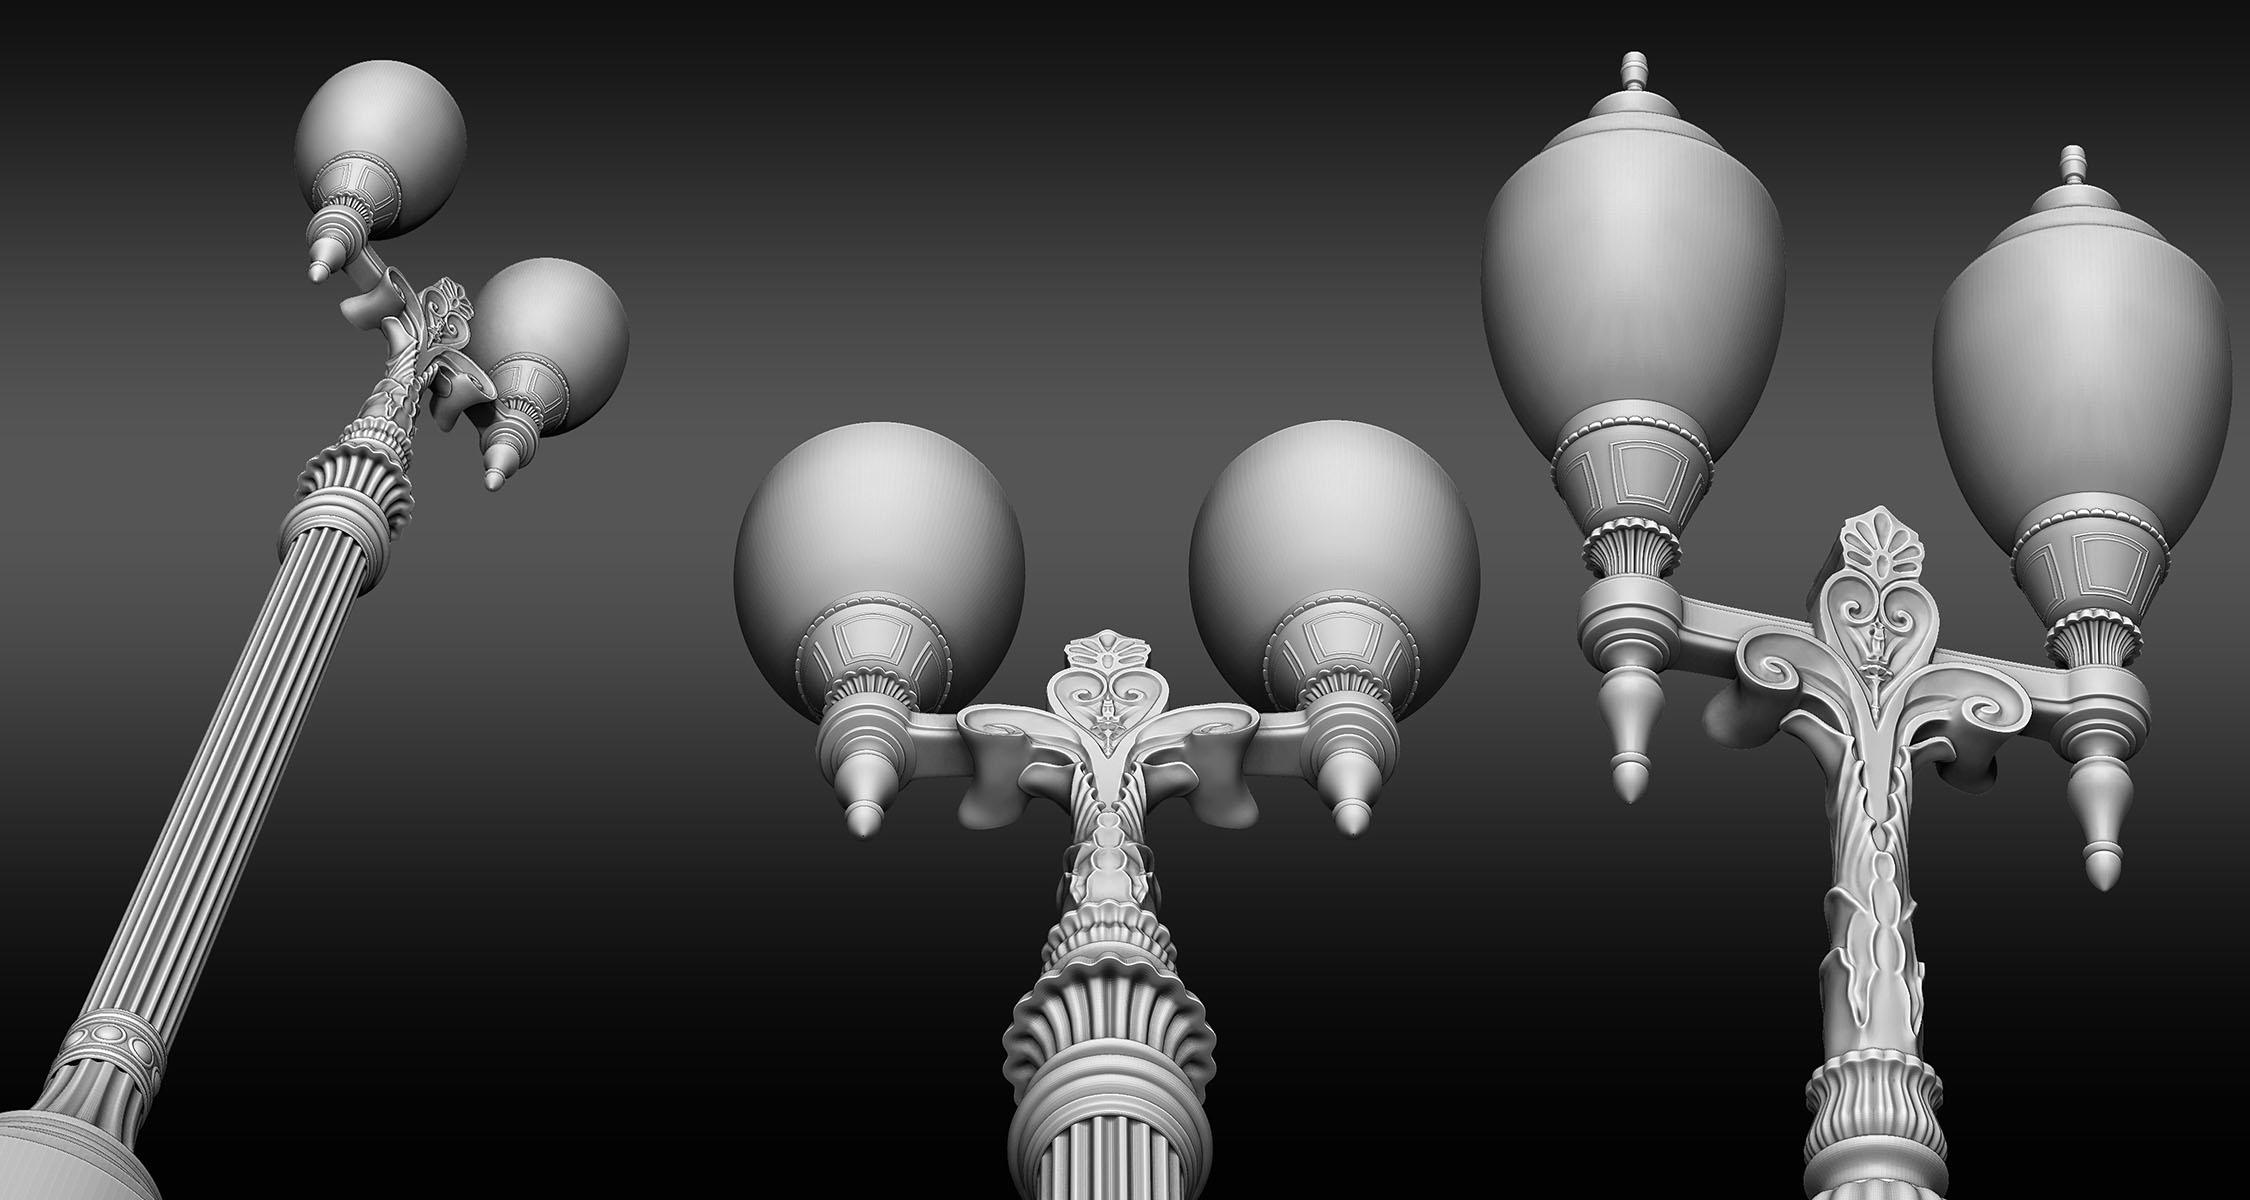 Lamp_Highpoly3.jpg